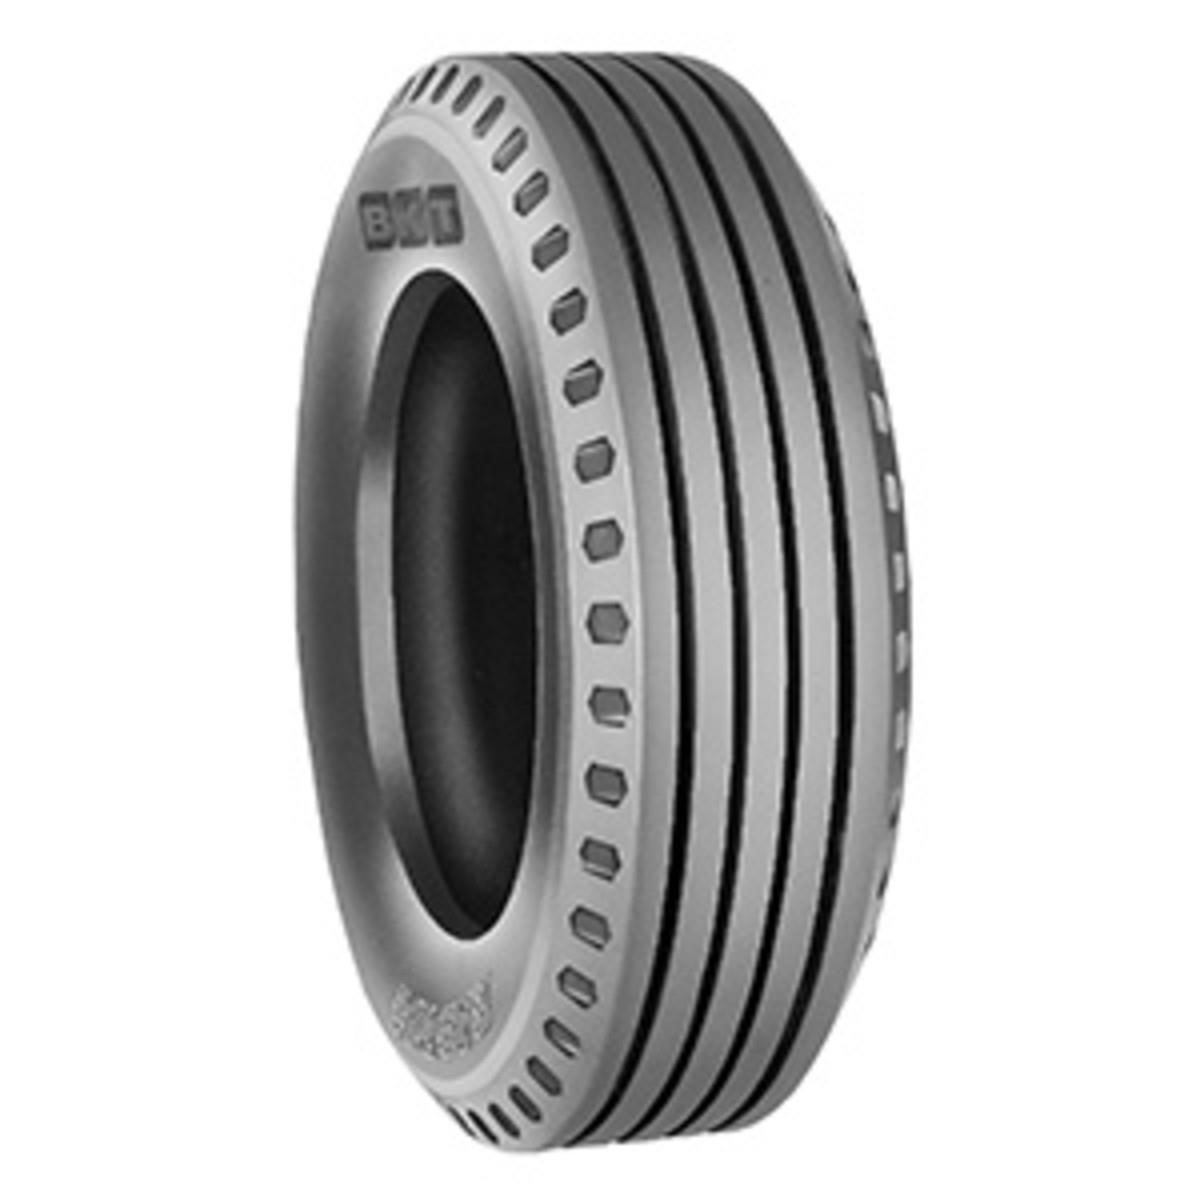 BKT 21.5-16.1 Wheels / Tires / Track